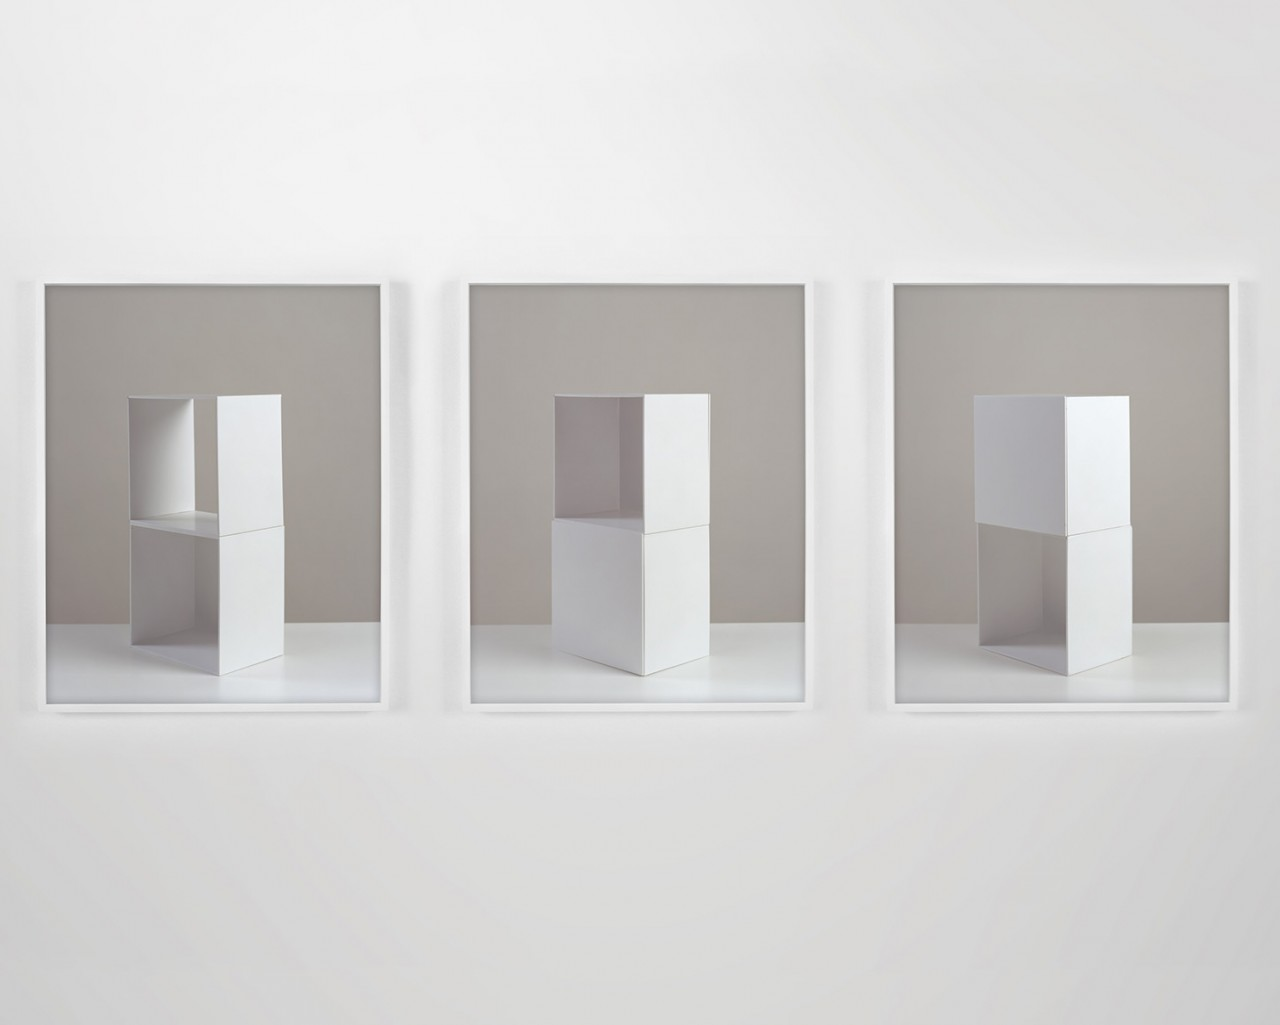 Studio Holger Kilumets Structures for Space